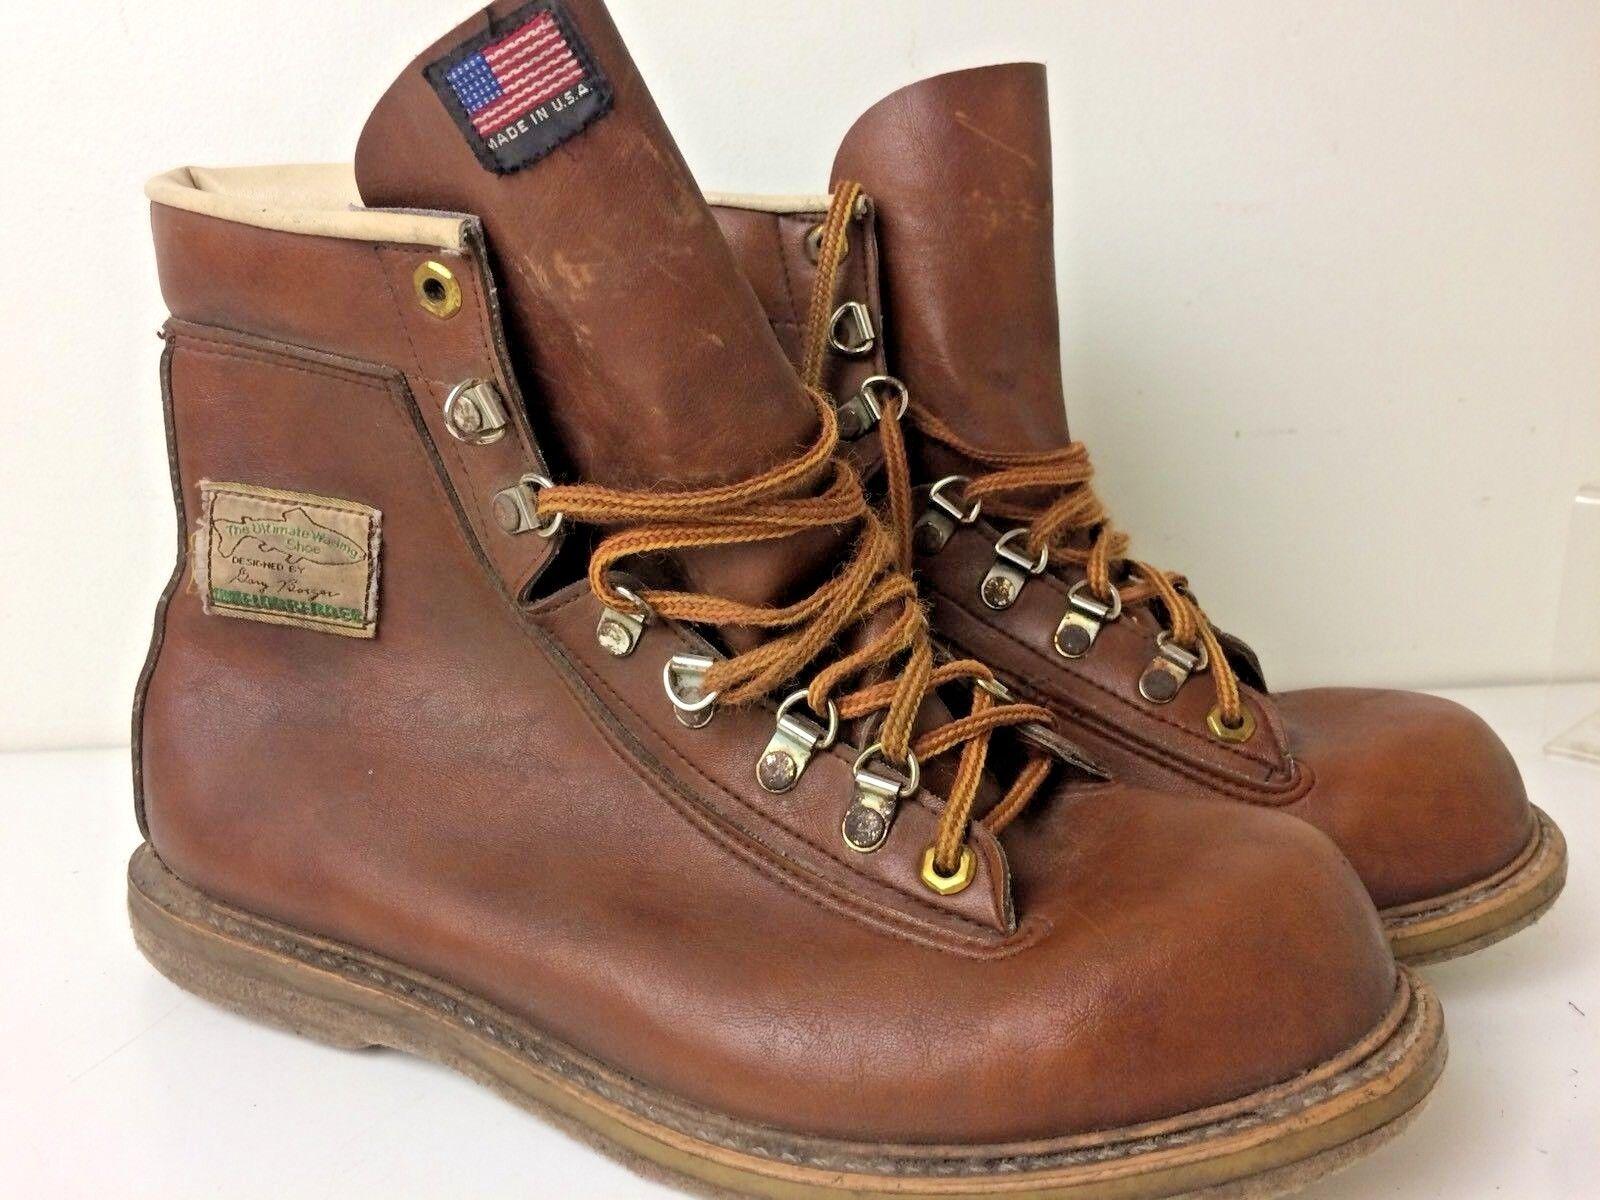 Vintage 80's Weinbrenner Ultimate Wading scarpe Gary Borger Fishing stivali 9